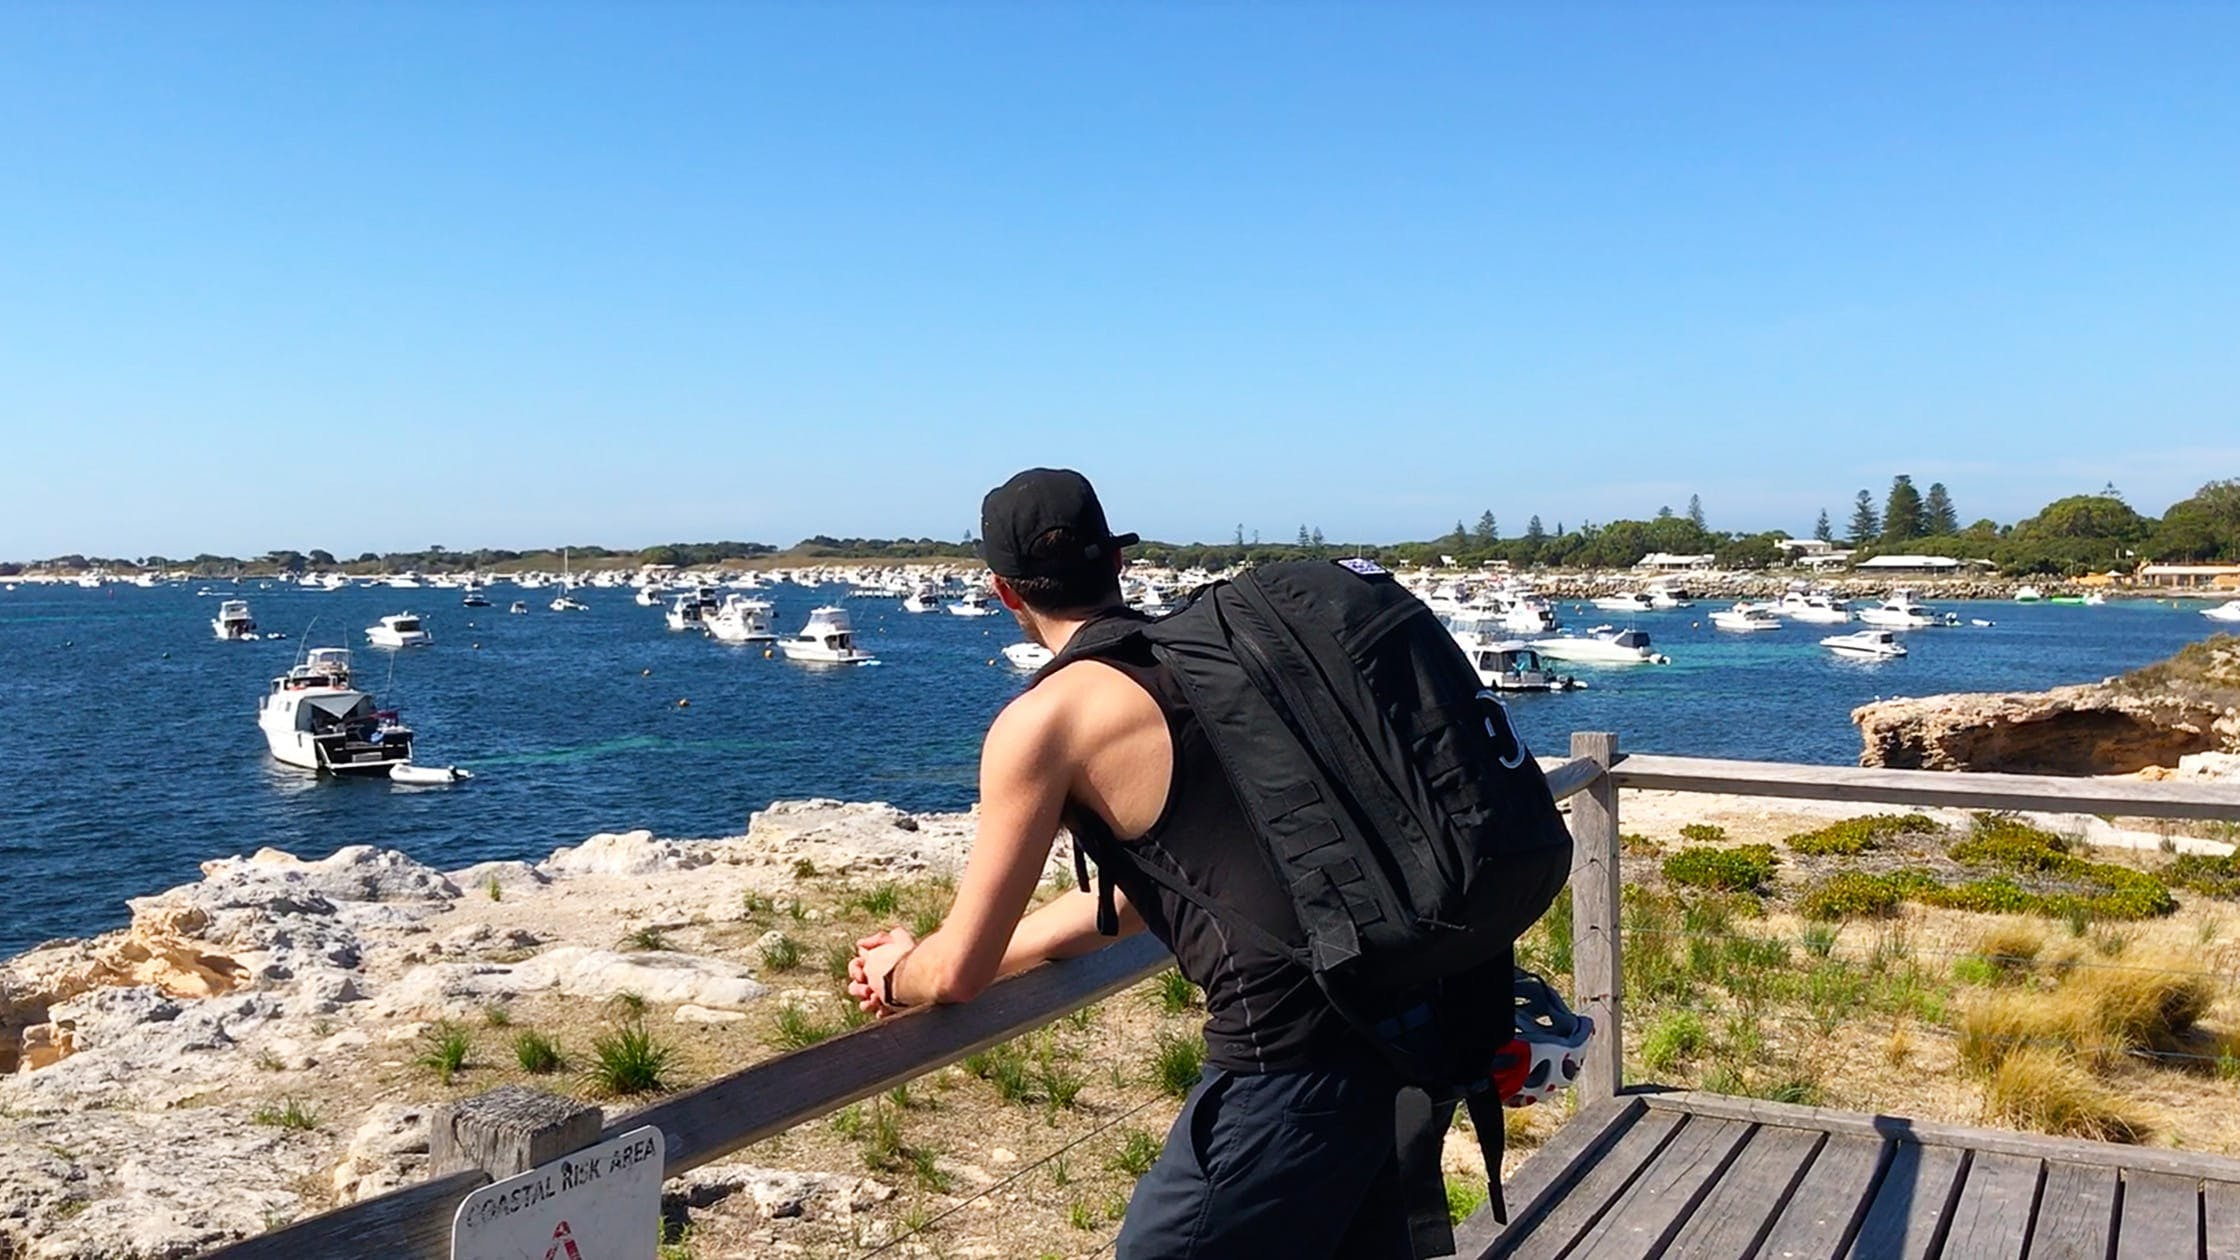 Testing the GORUCK GR2 on Rottnest Island, Perth, Australia